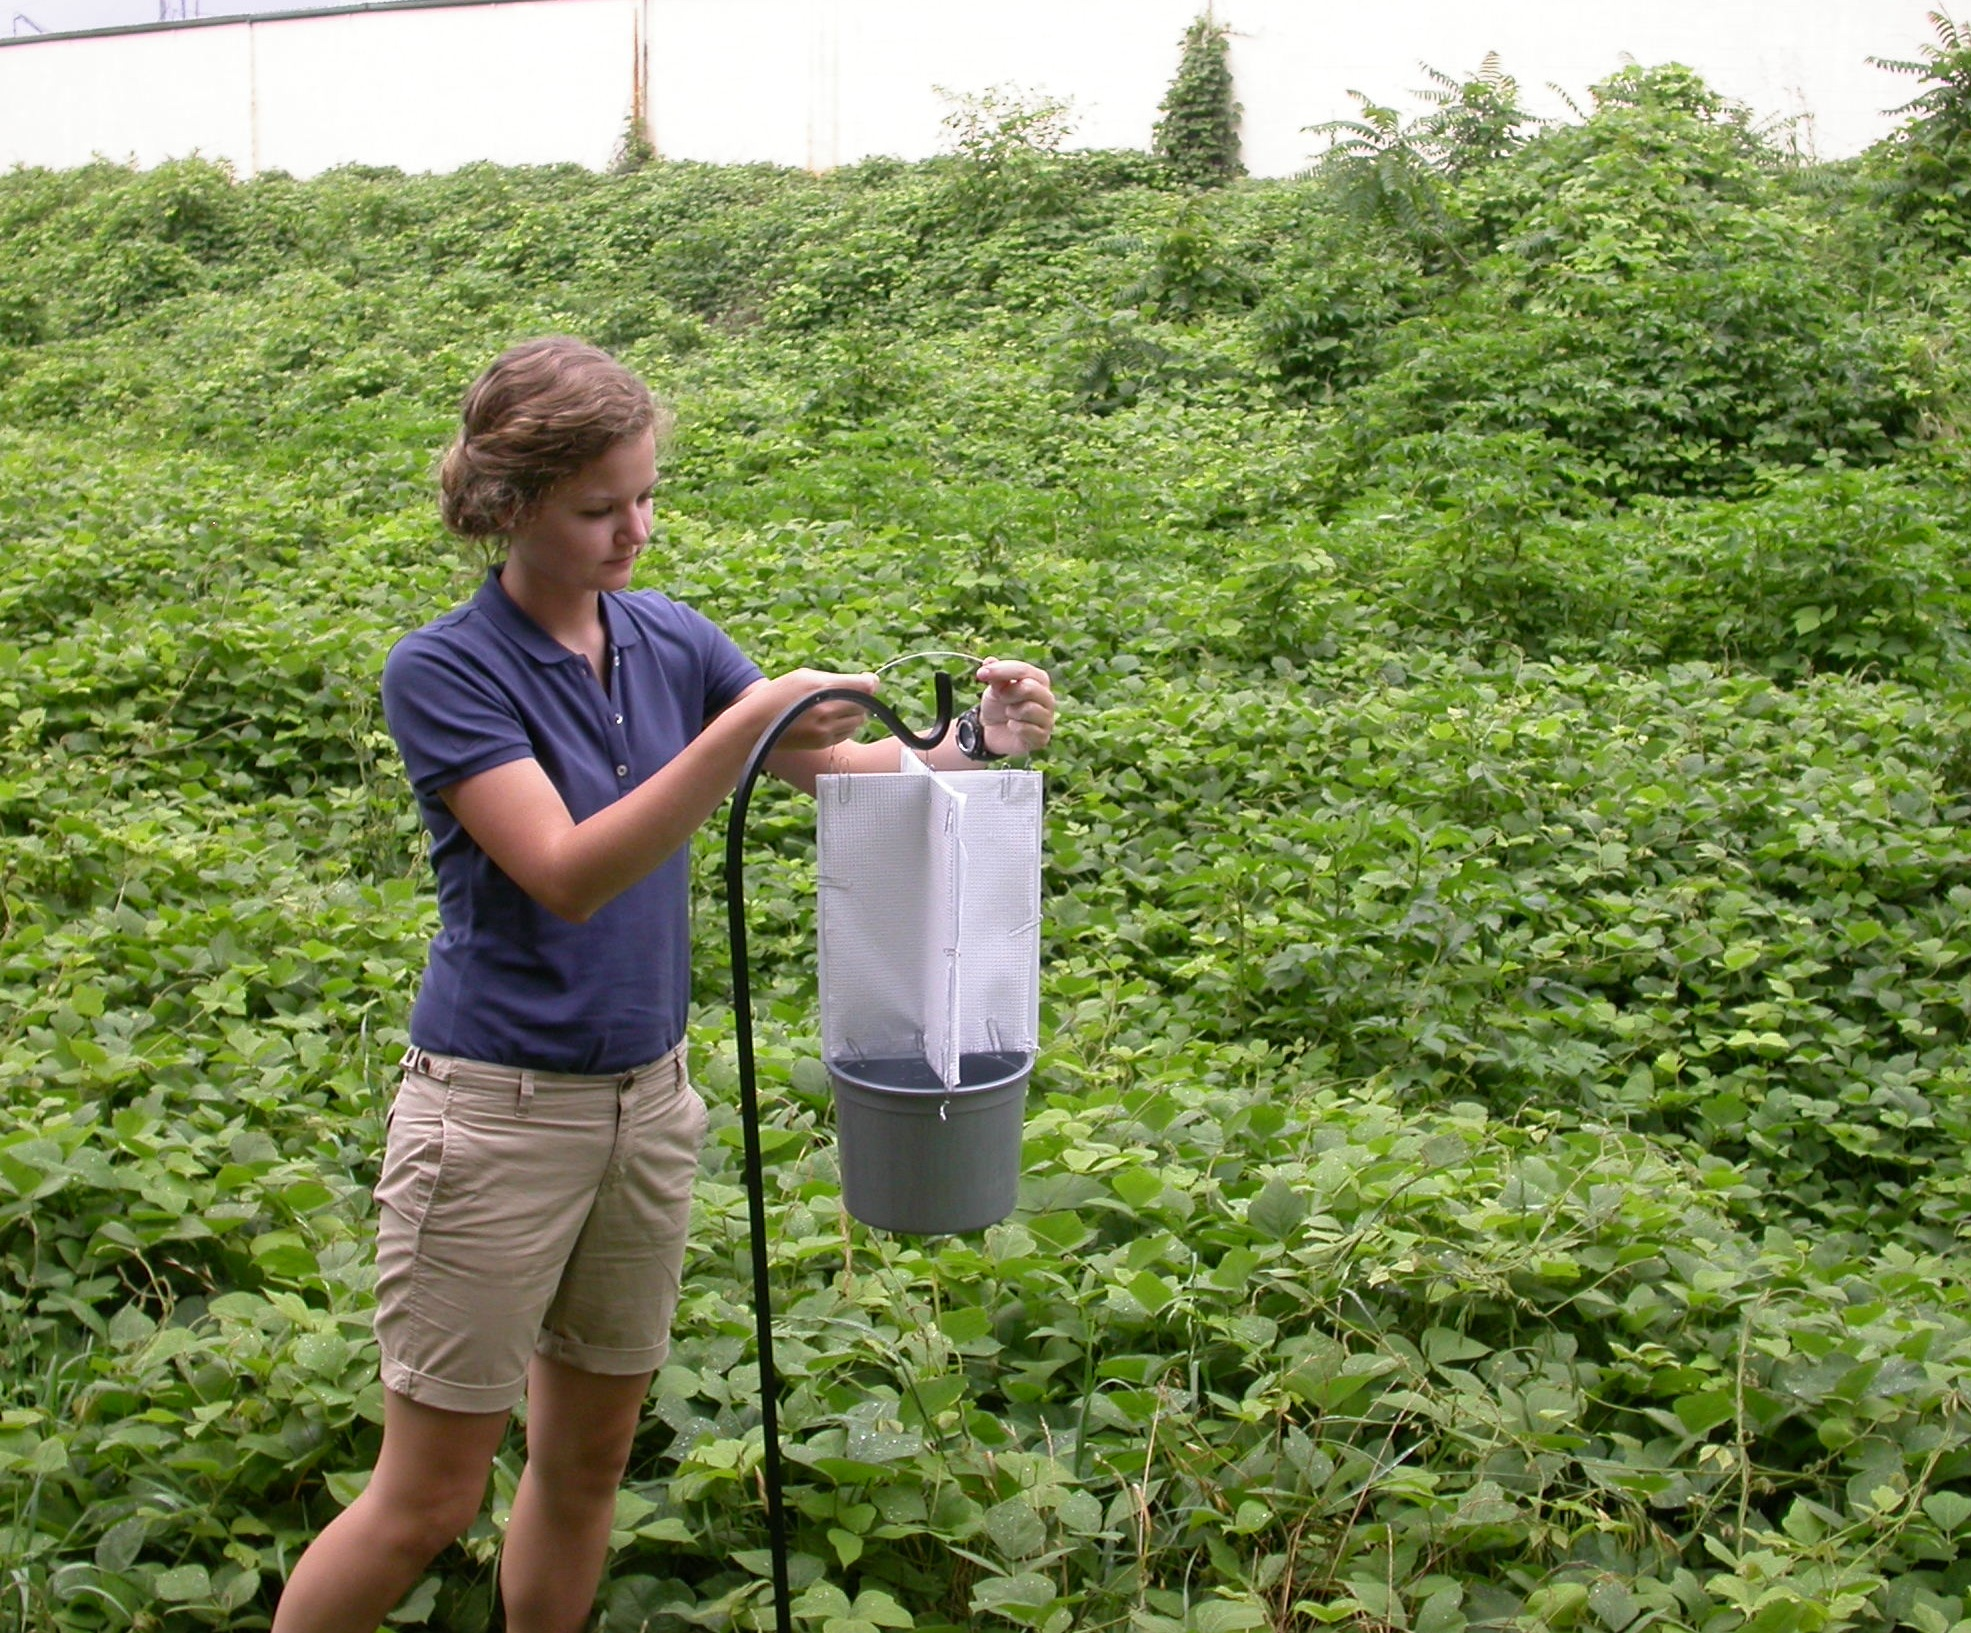 University of Georgia entomology intern Anna Marie Heape places a kudzu bug trap in a kudzu patch on the UGA campus in Griffin, Ga.